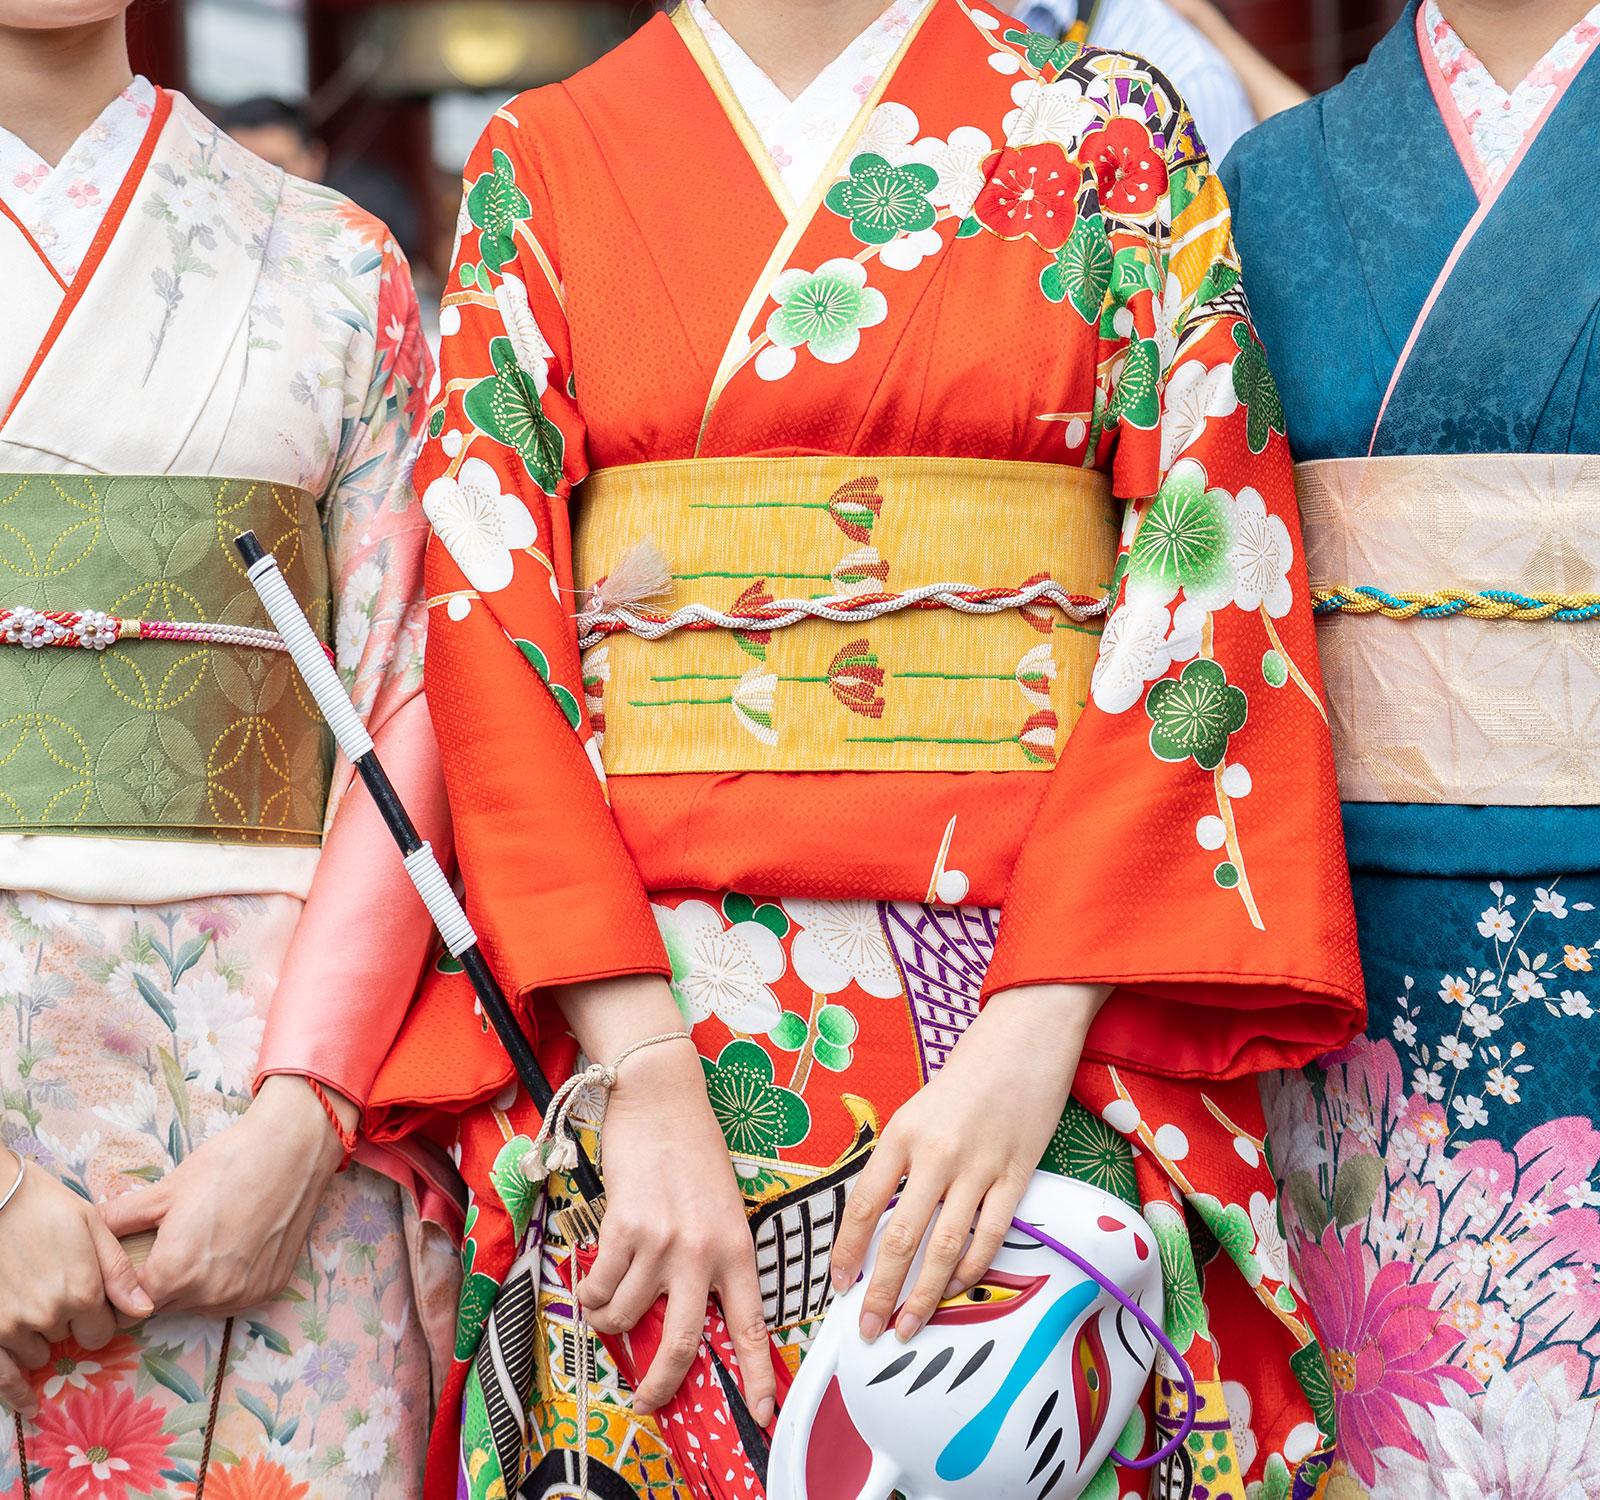 Women wearing traditional kimonos